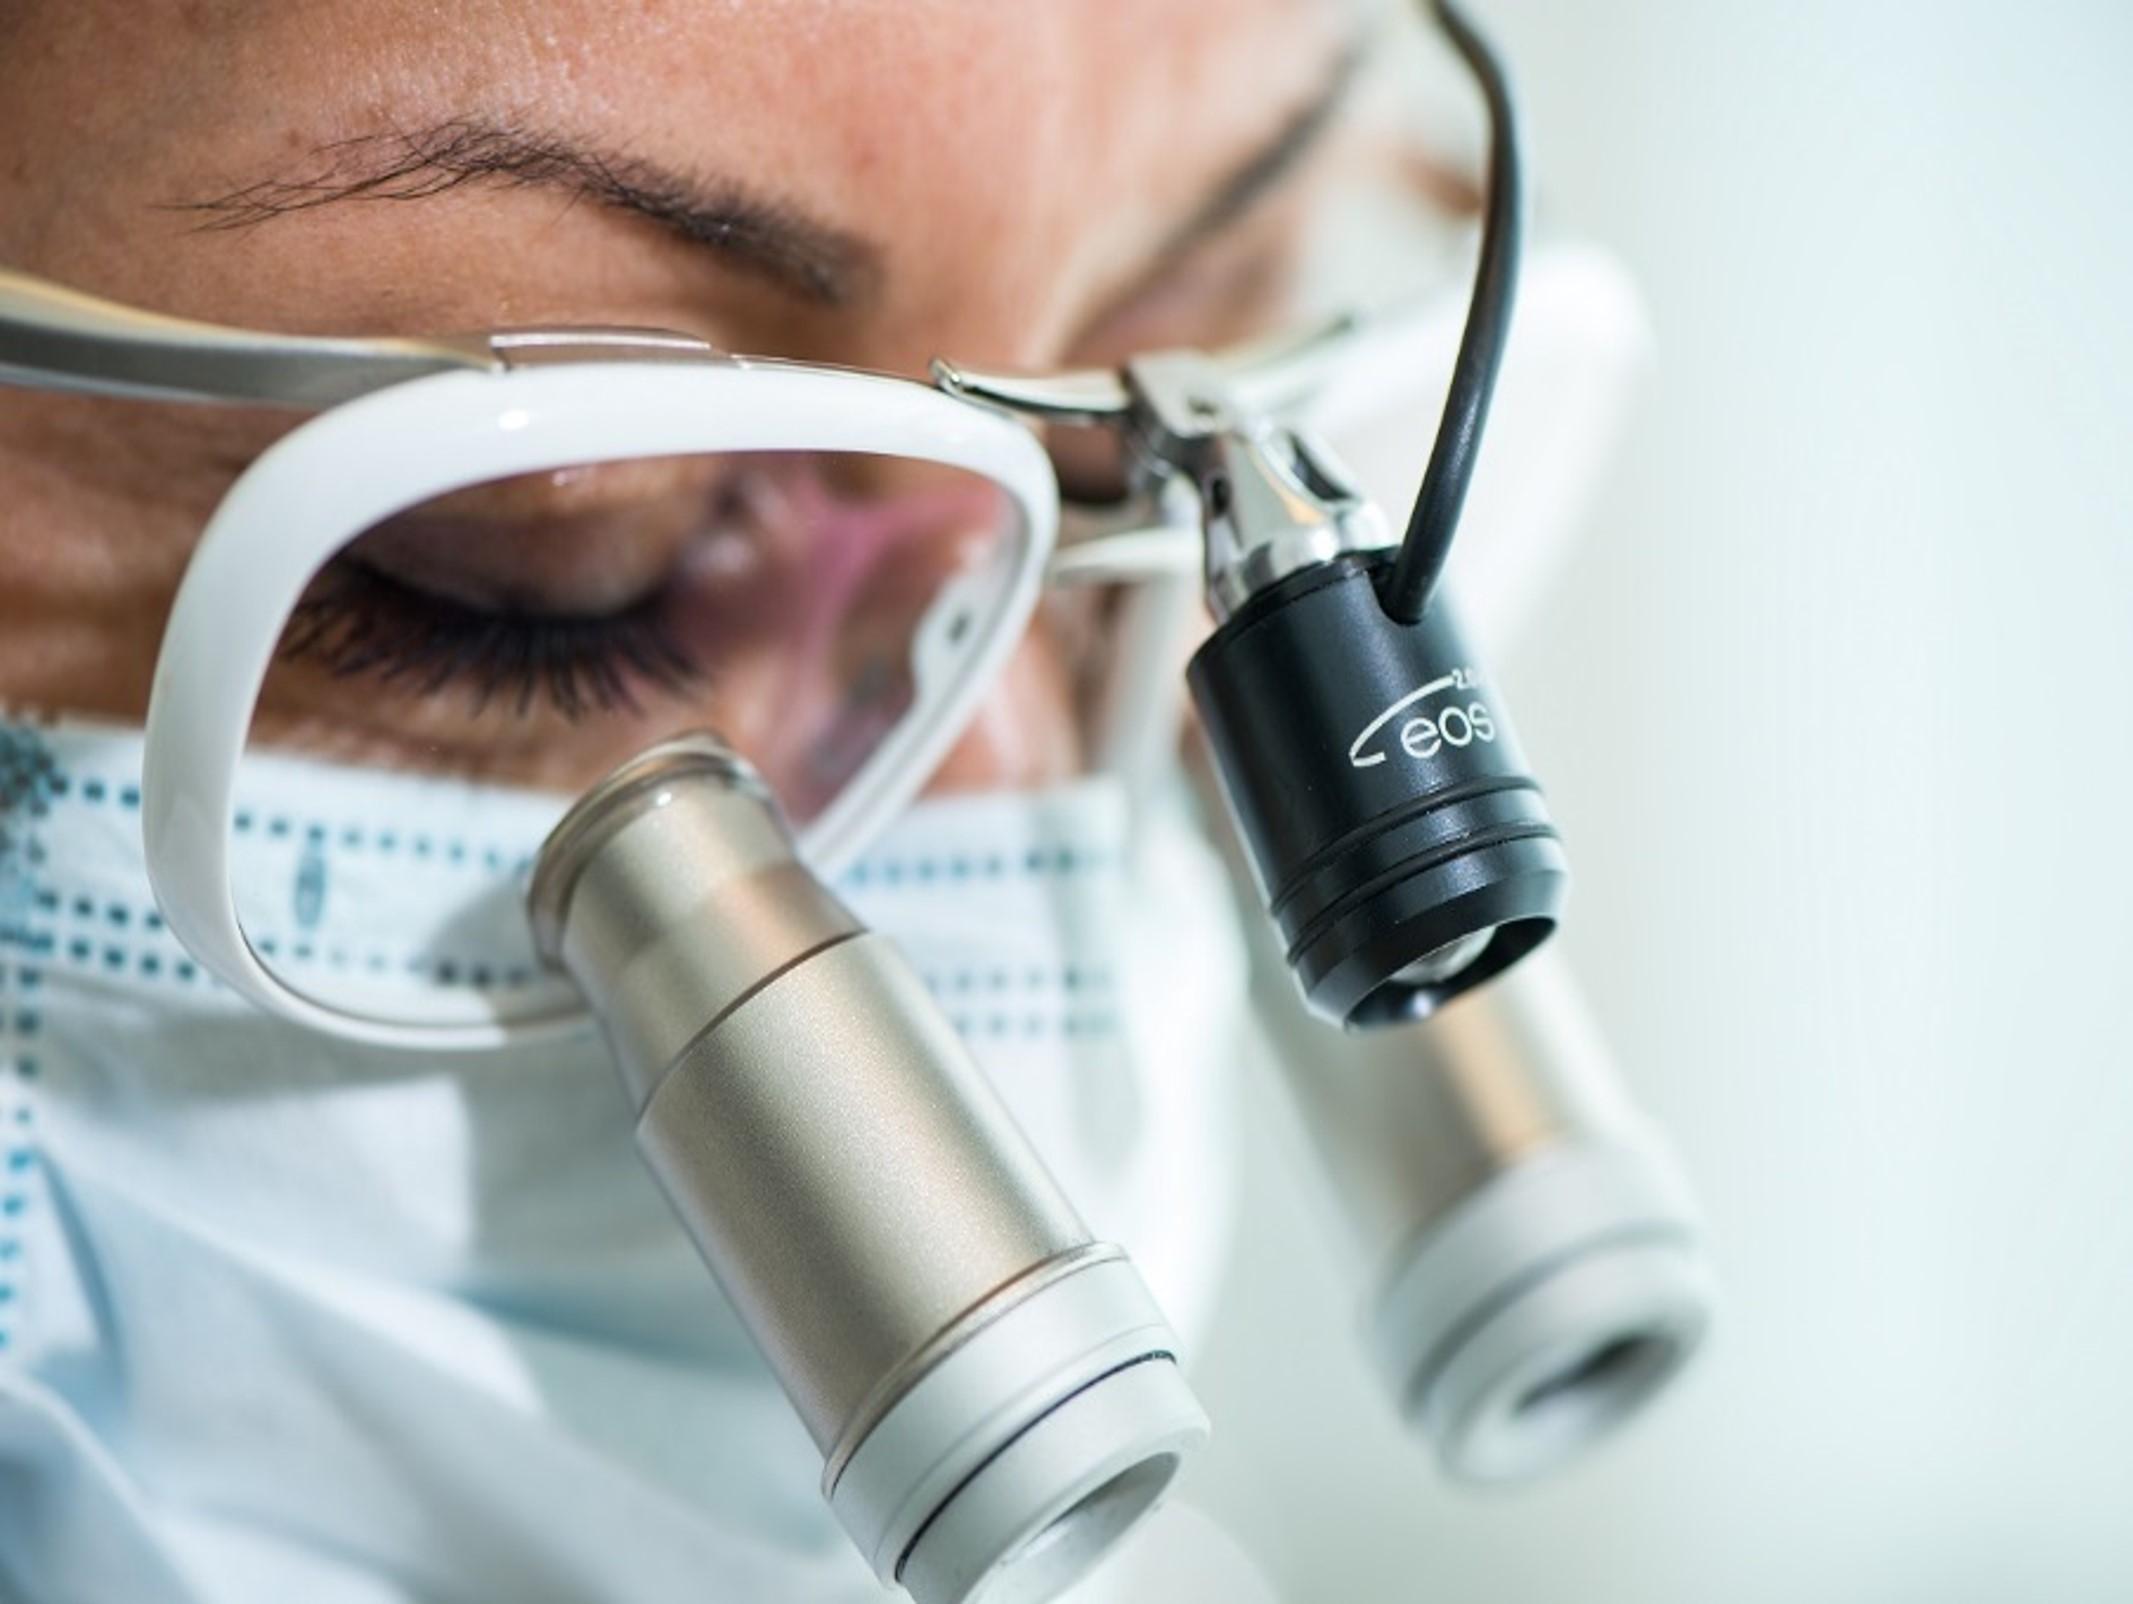 Endodontoloog met loepbril